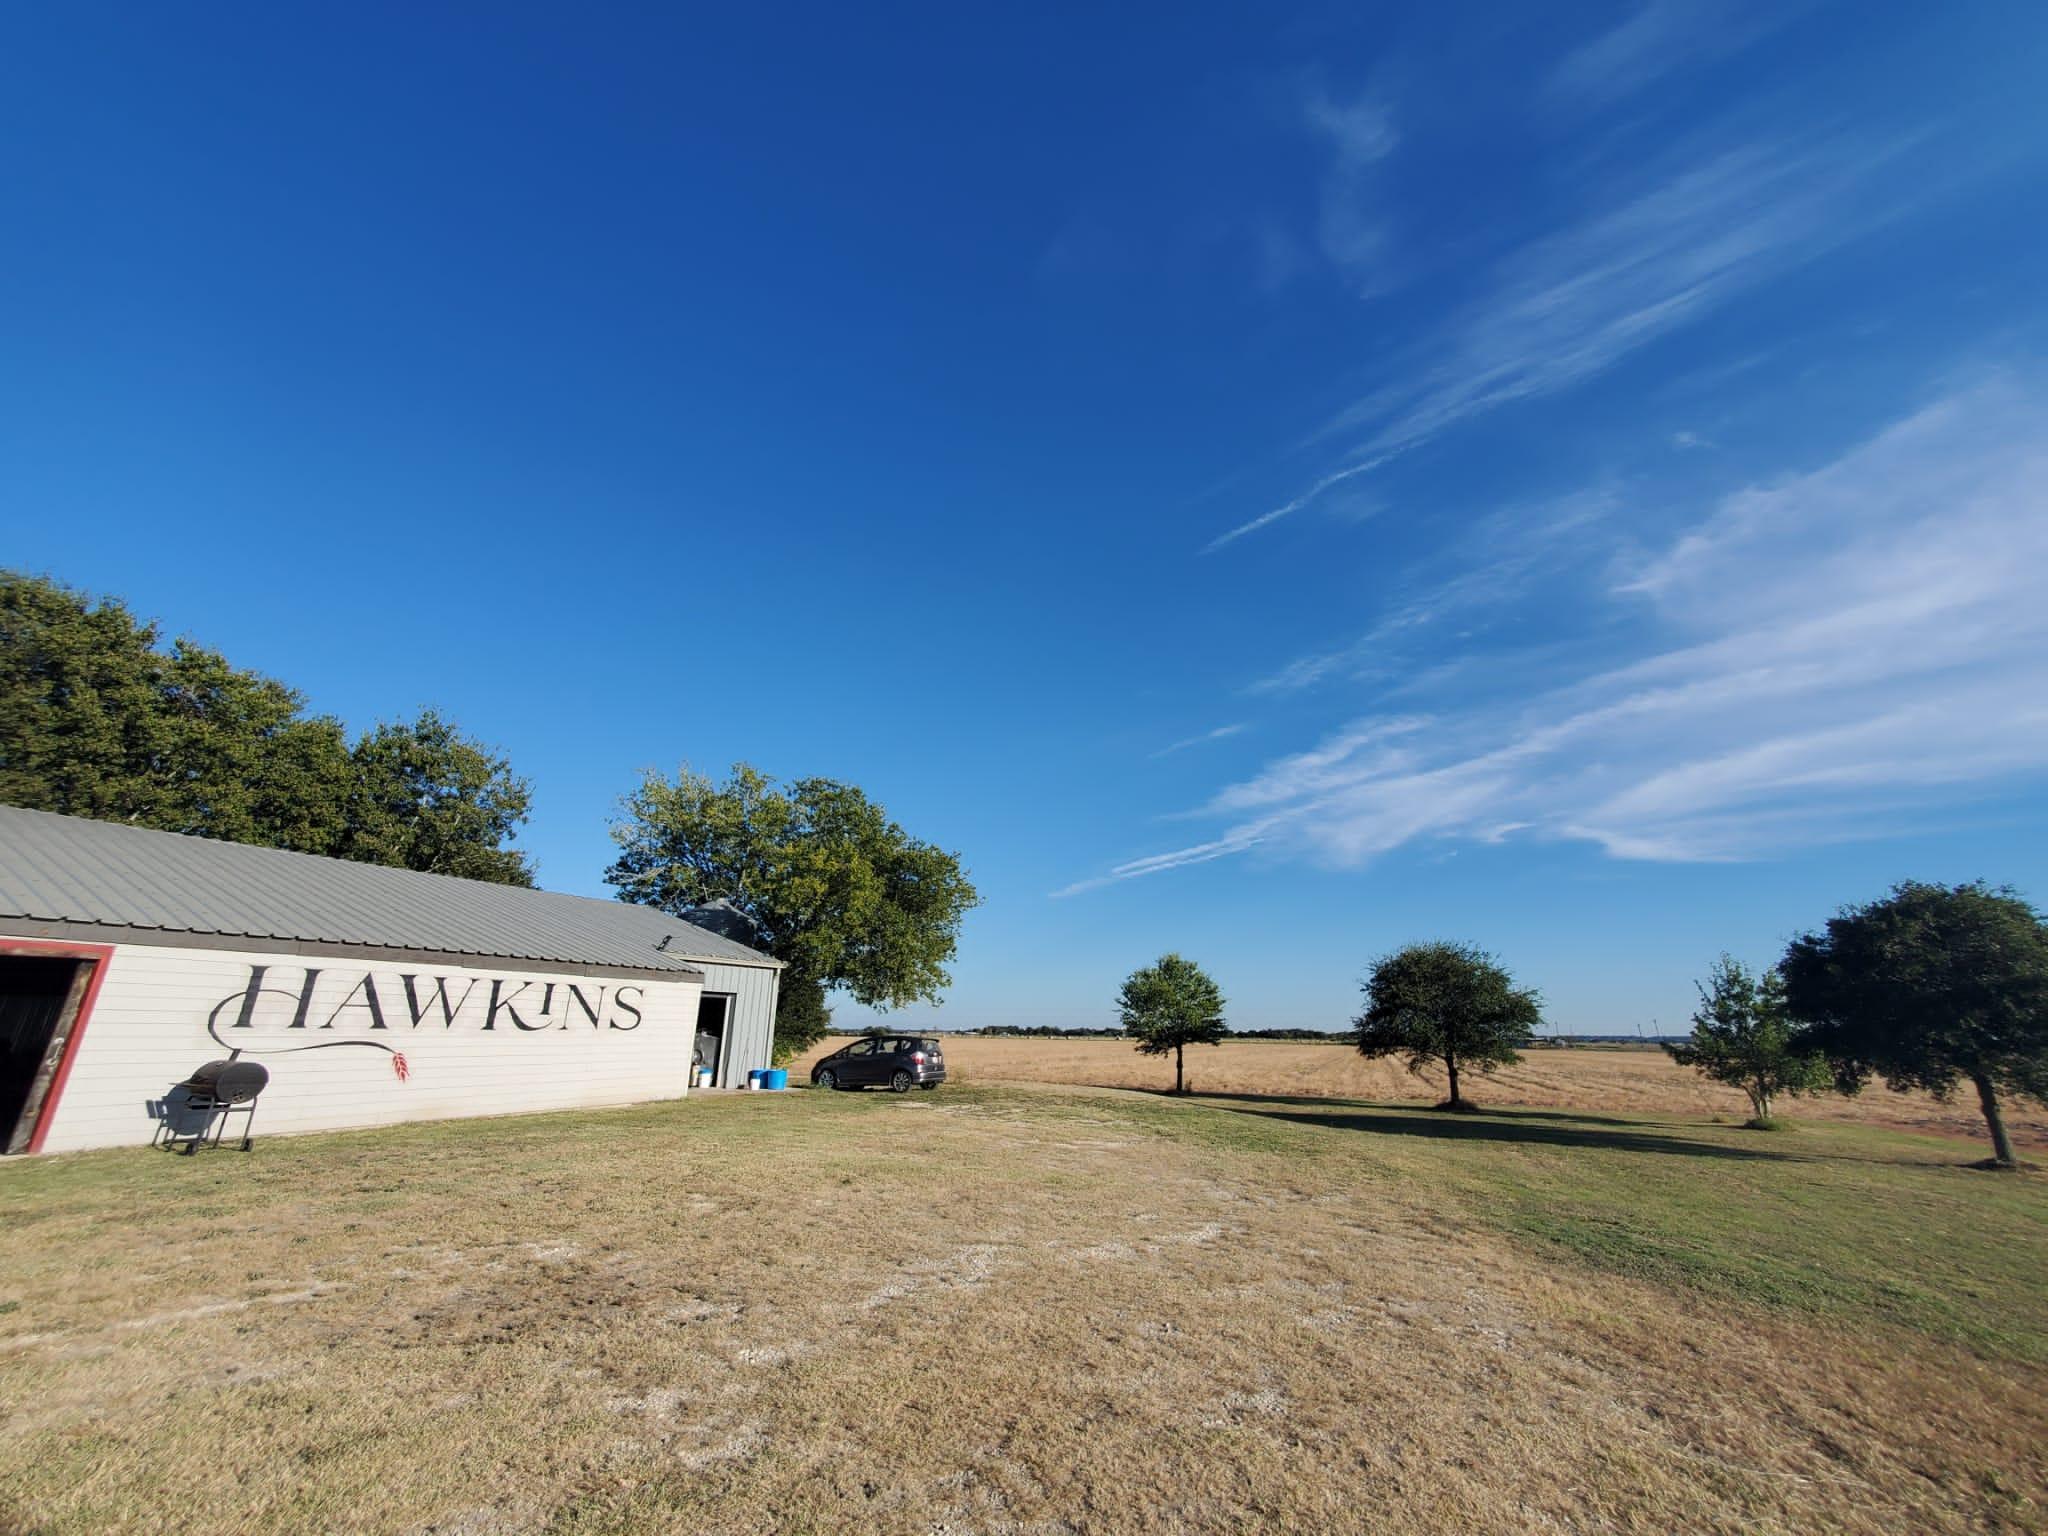 Hawkins Farmhouse Ales, photo credit Johan Mata